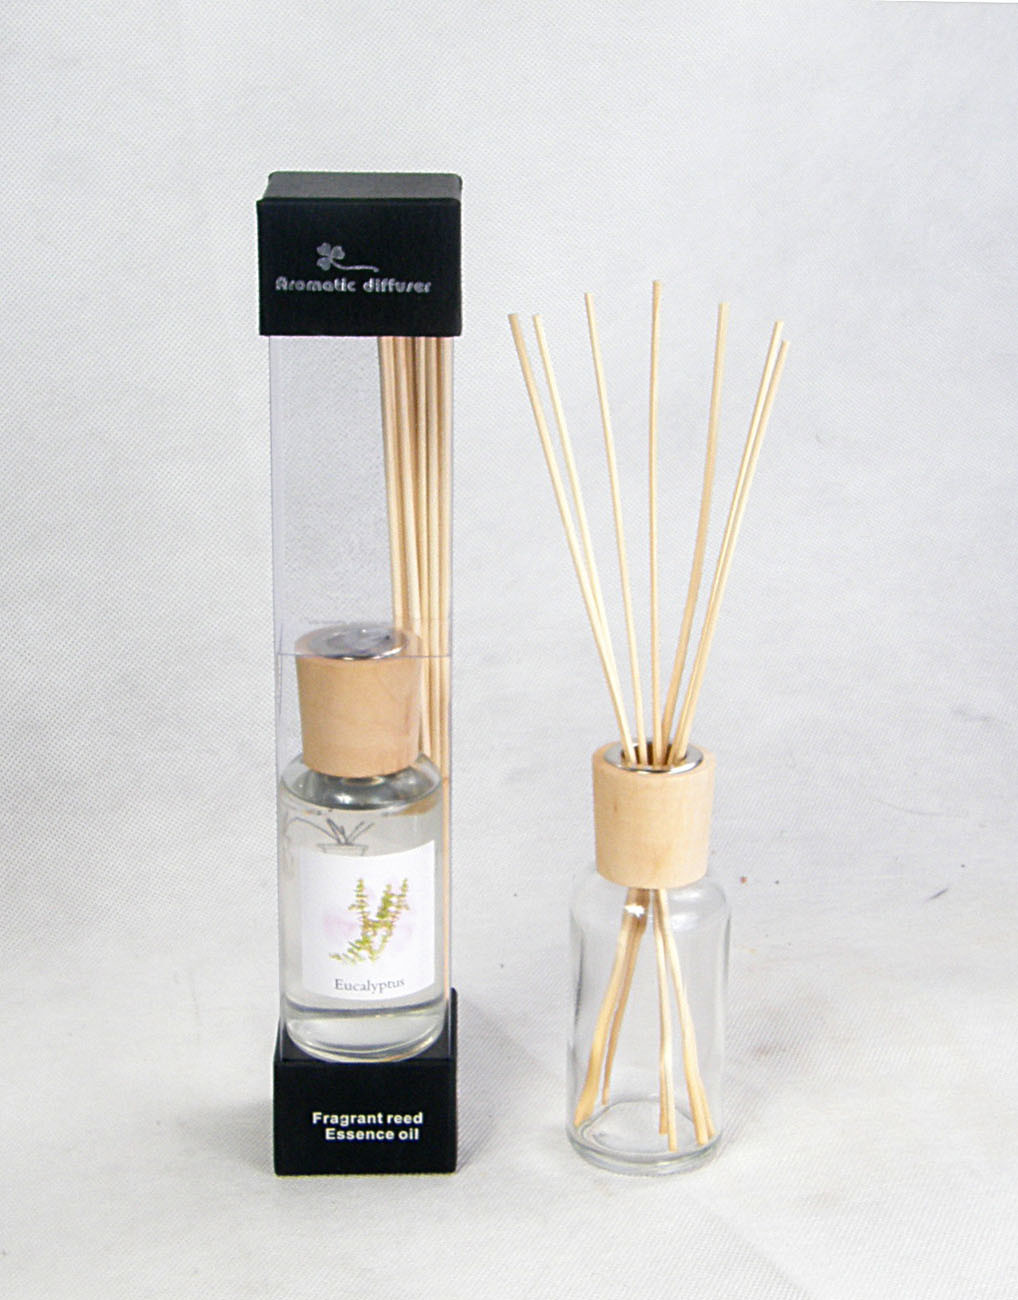 2016 Glass Bottle/ Aroma Bottle/ OEM Perfume Bottle 100 Ml with Cap/ Have Stock